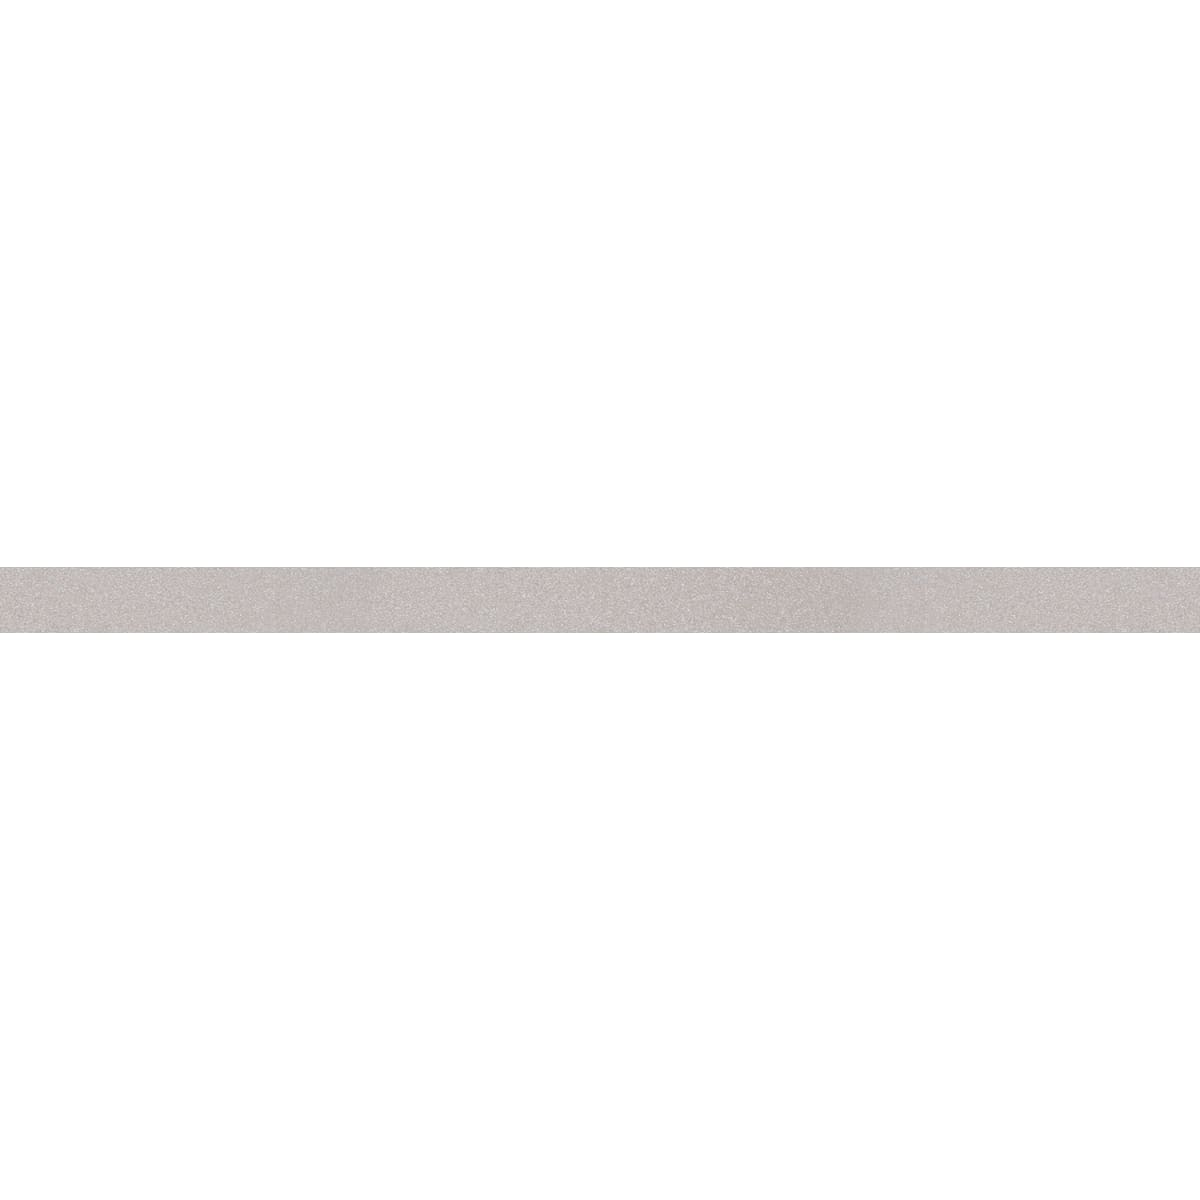 Бордюр настенный Sakura «Модерн» 2.5x45 см цвет серый